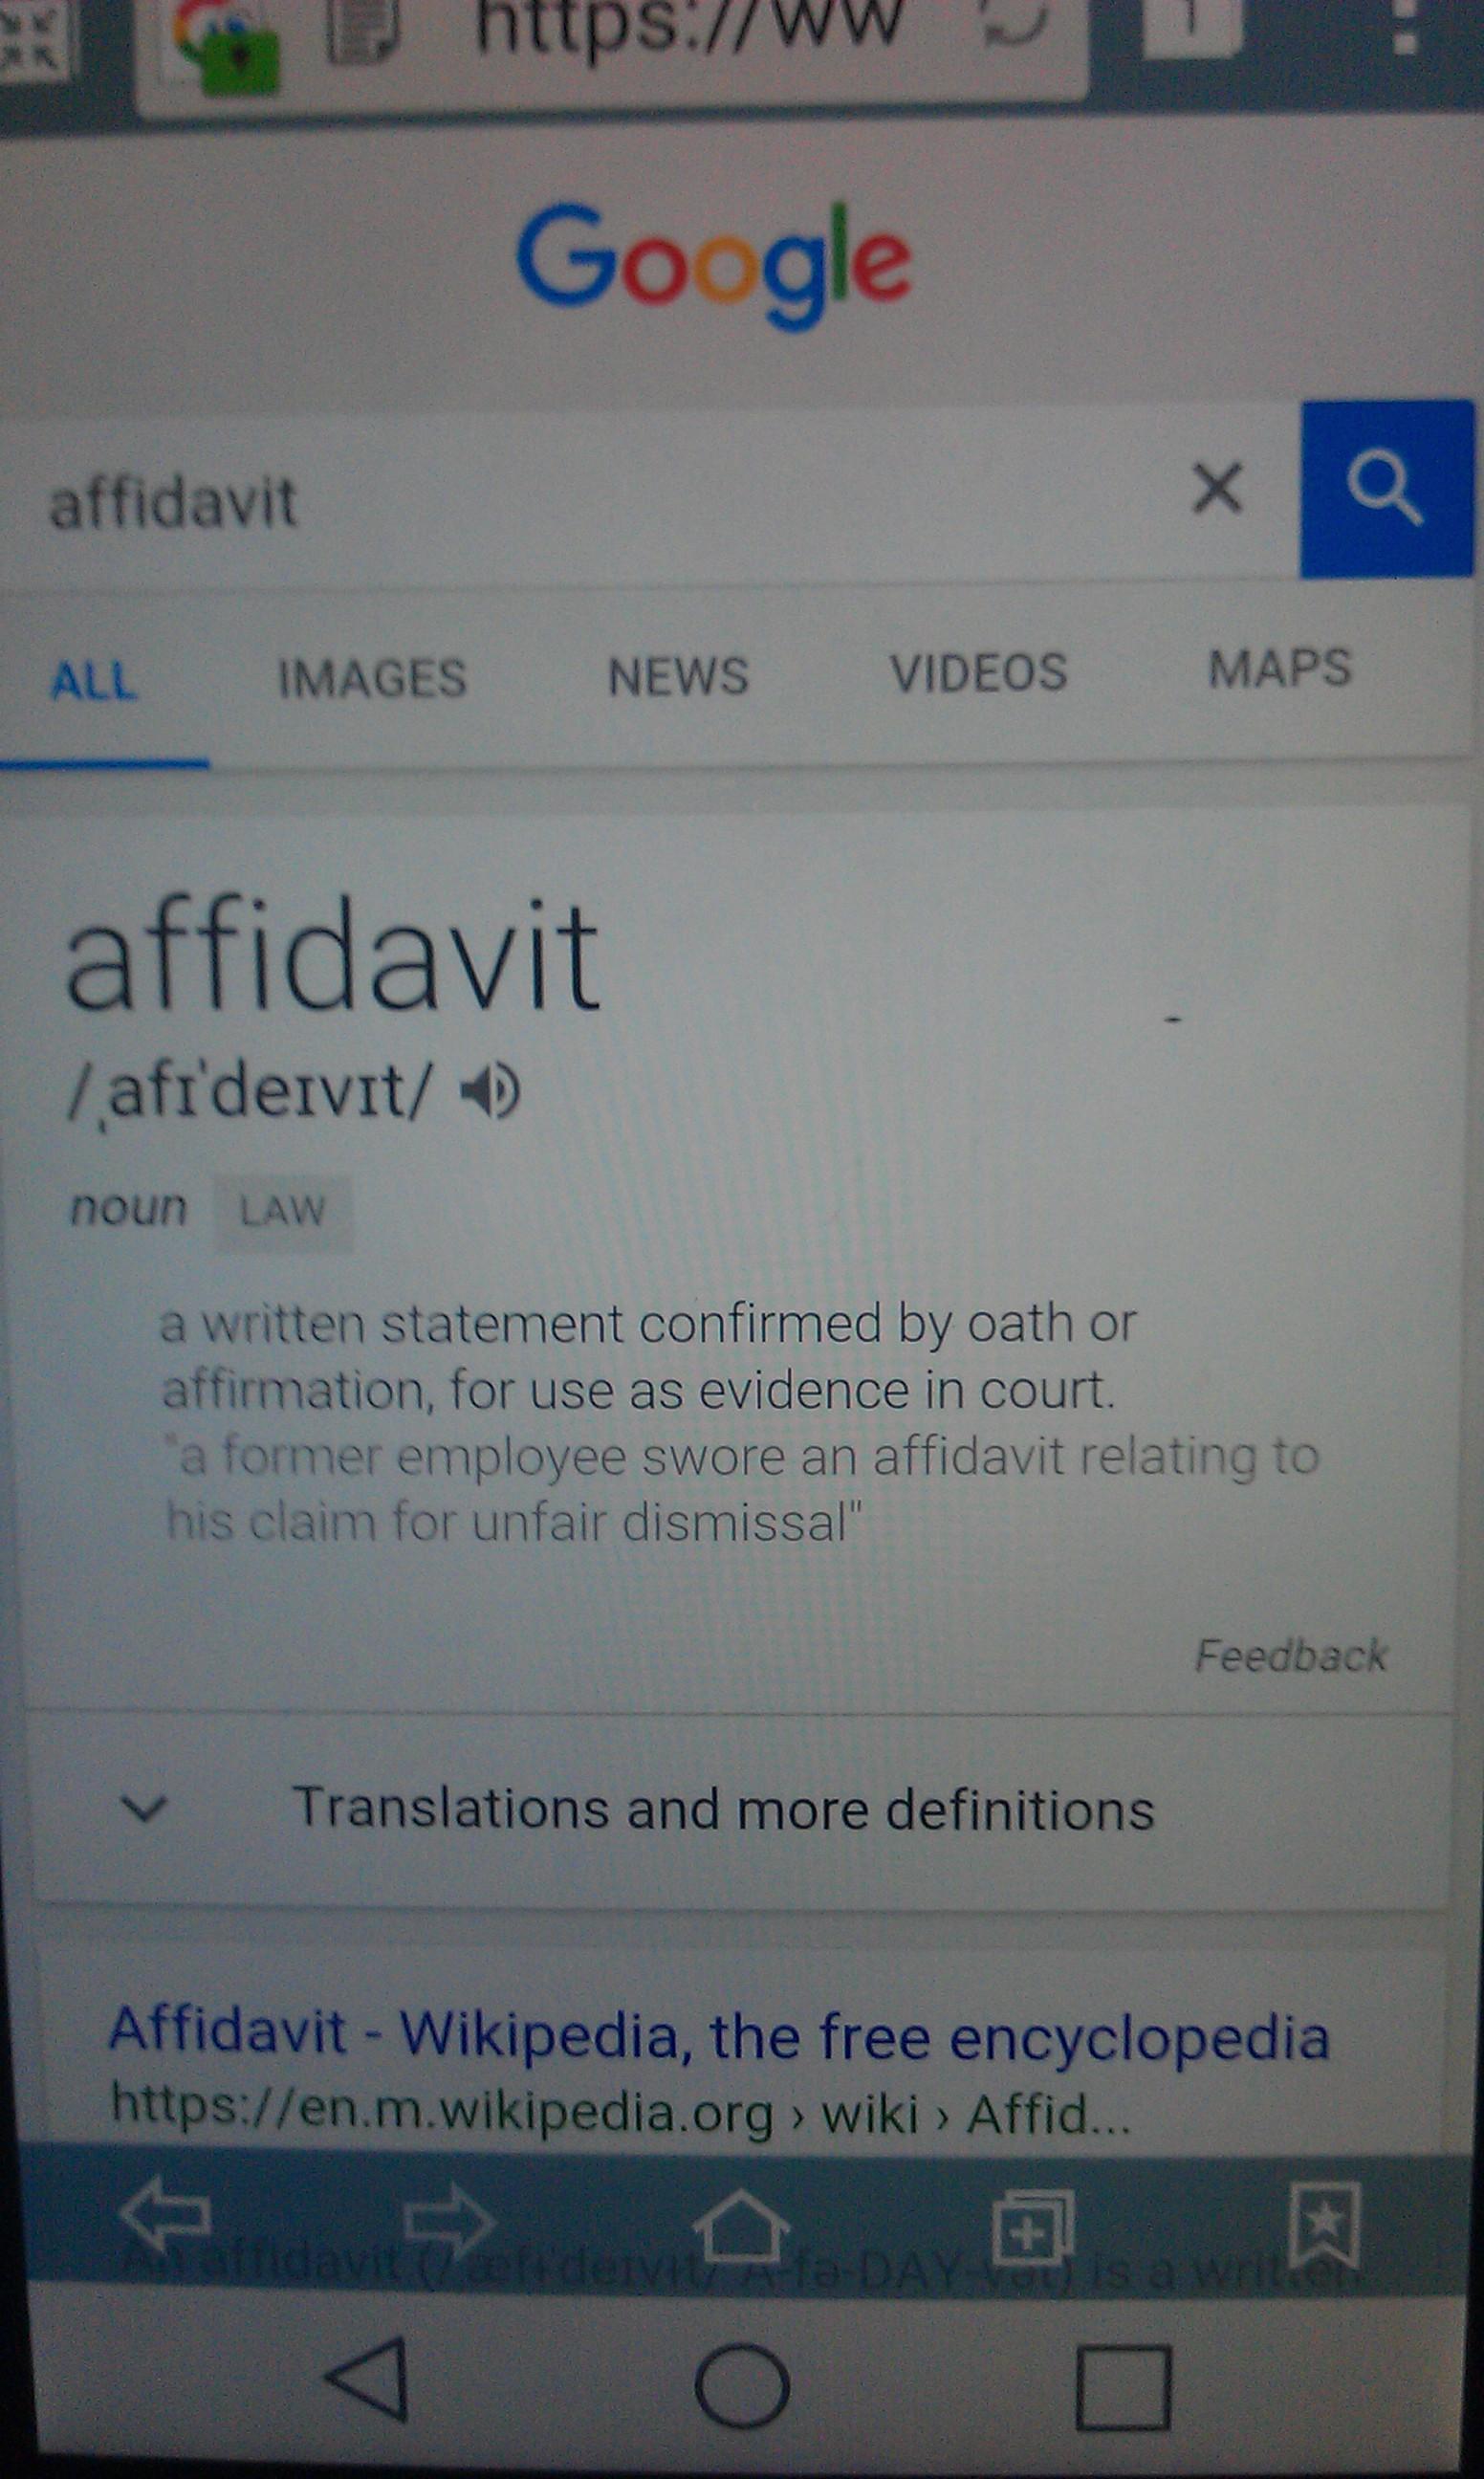 http://www.bentcop.biz/affidavit2.jpg